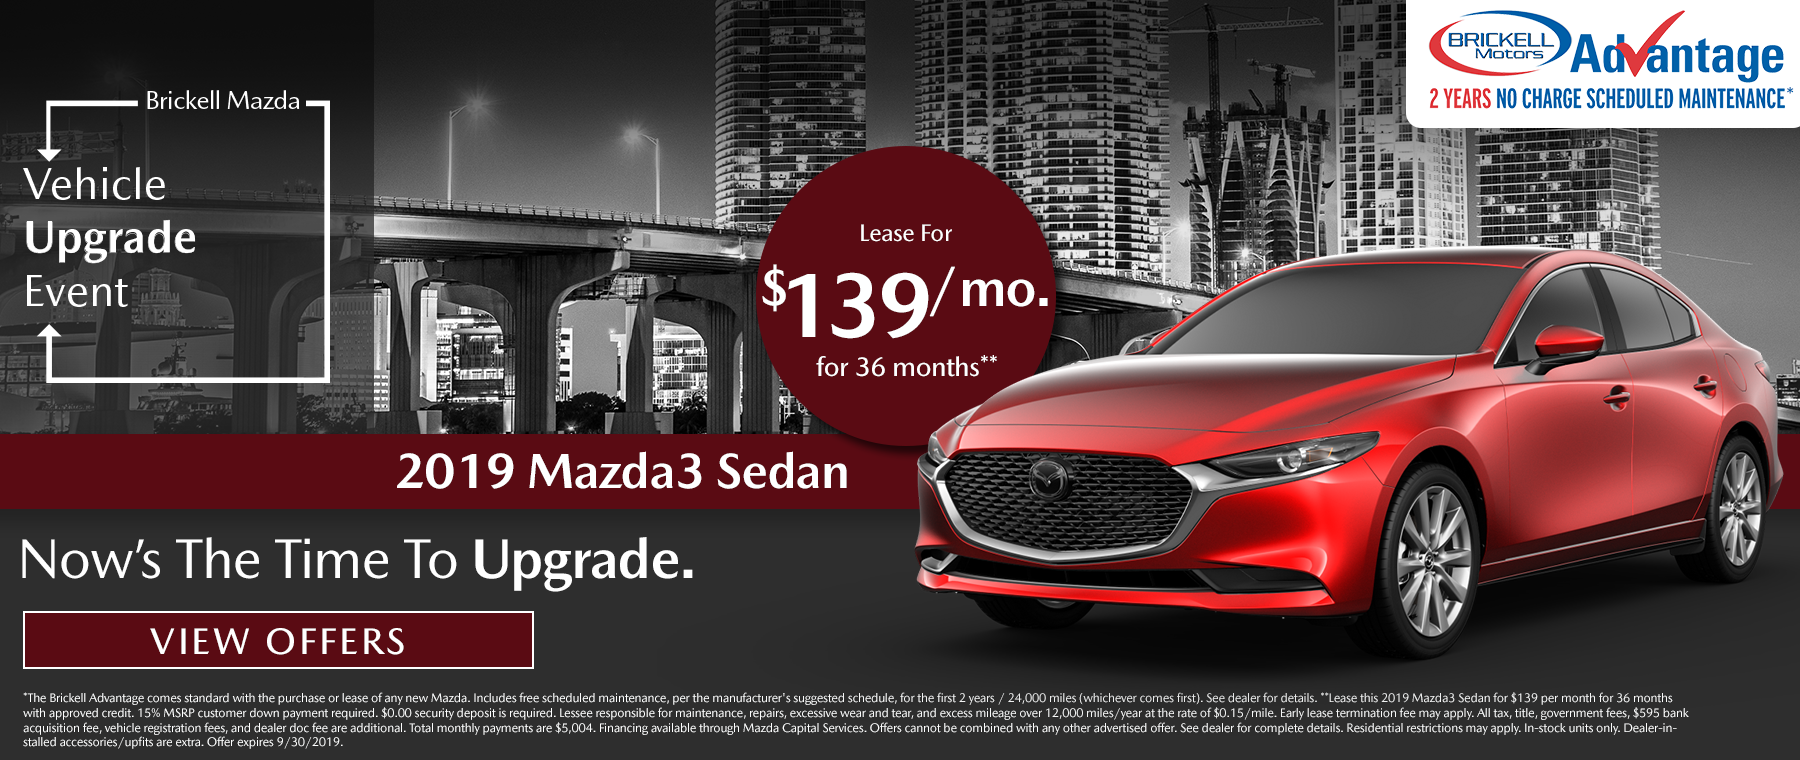 Brickell Mazda Mazda3